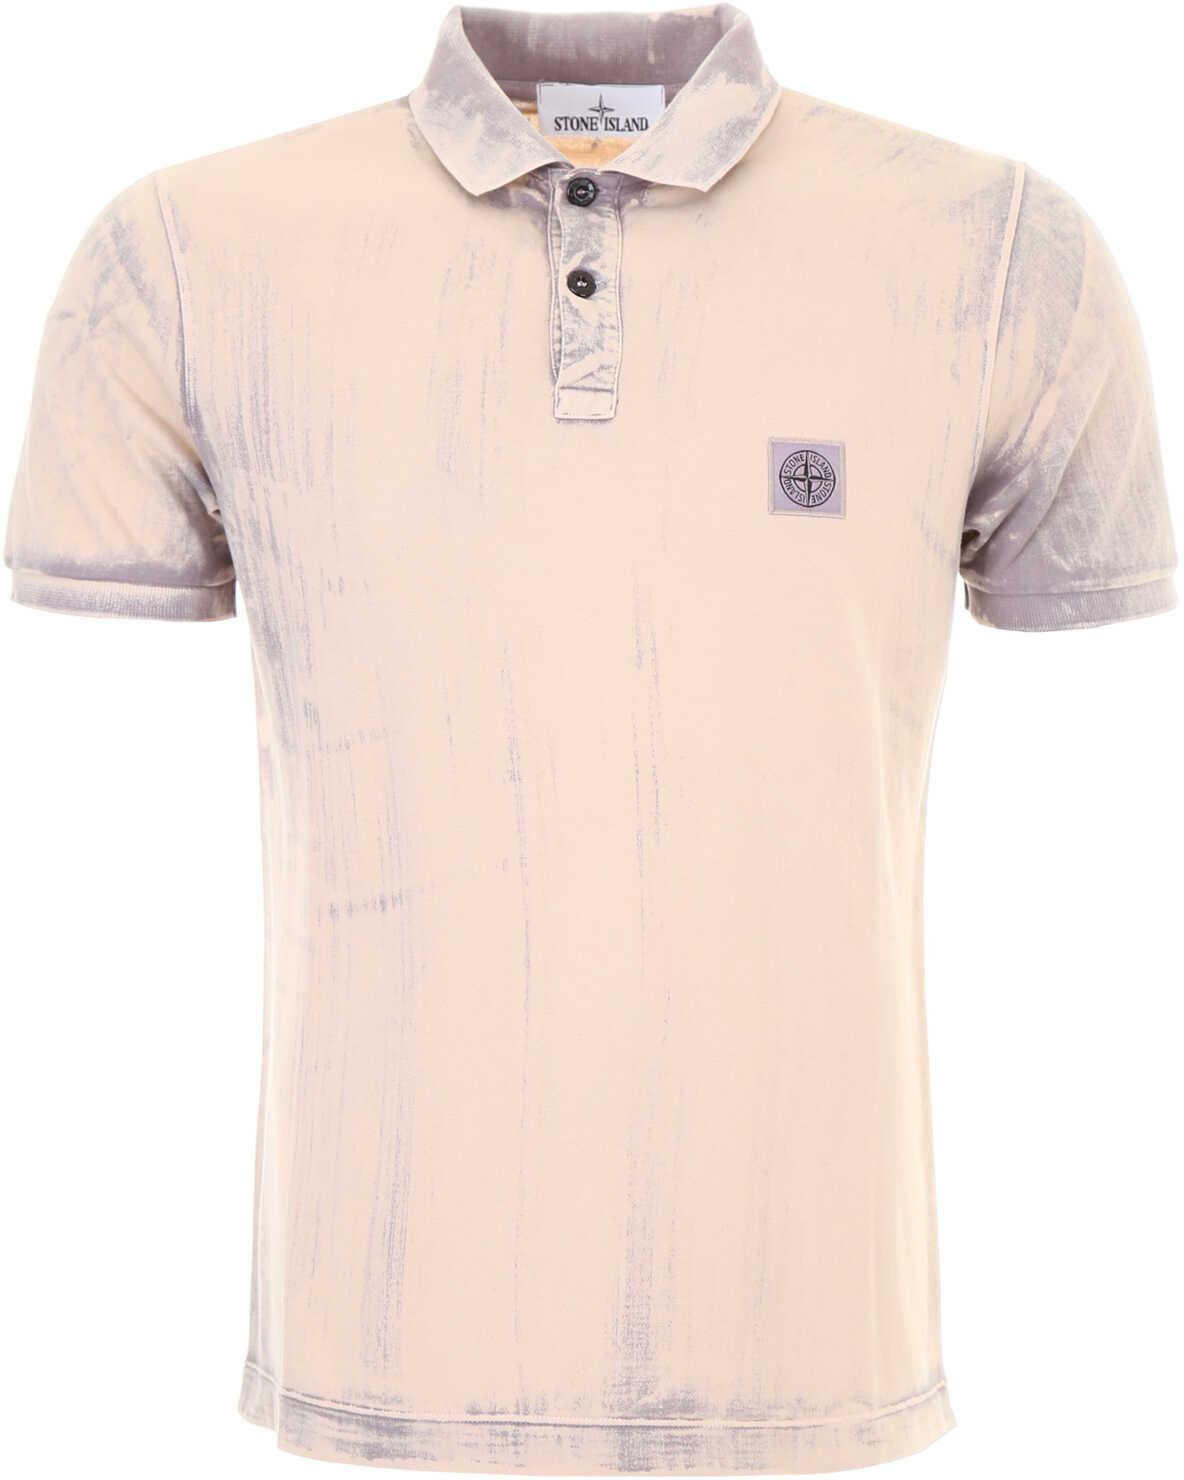 Stone Island Tie And Dye Polo Shirt SALMON